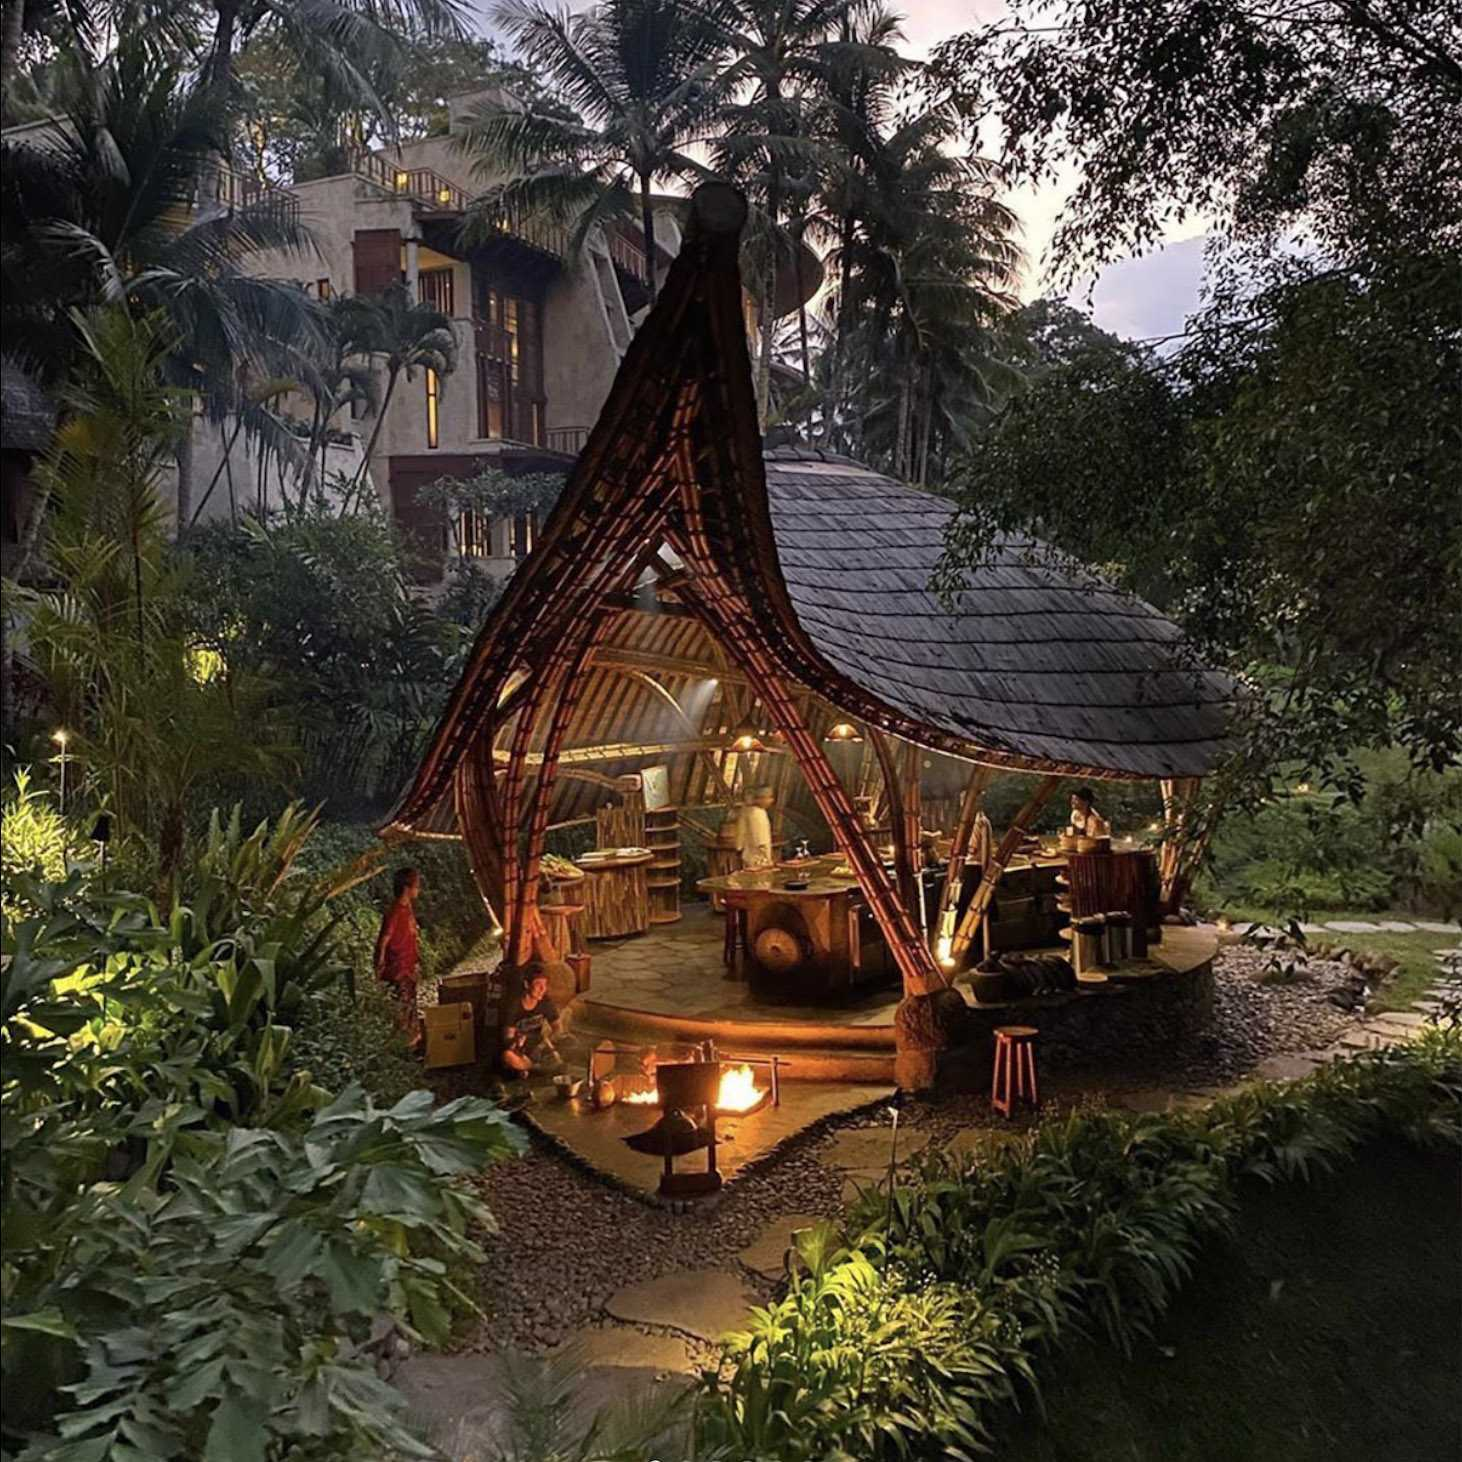 Agung Budi Raharsa | Architecture & Engineering Sokasi Bamboo Cooking Class / School - Bali Bali, Indonesia Bali, Indonesia Agung-Budi-Raharsa-Sokasi-Cooking-Class-School-Bali  88763